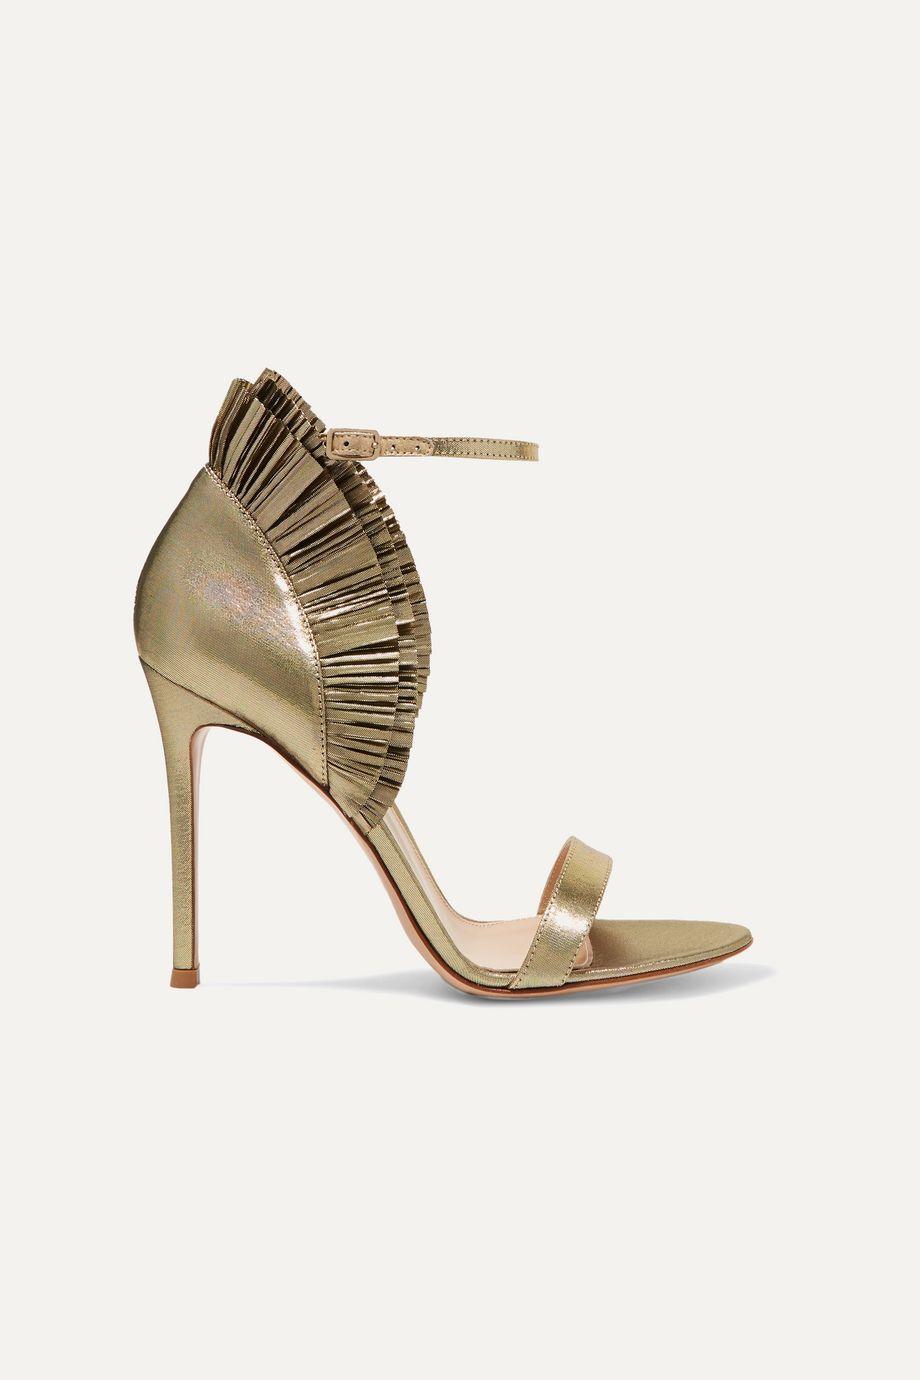 Gianvito Rossi 105 ruffled lamé sandals